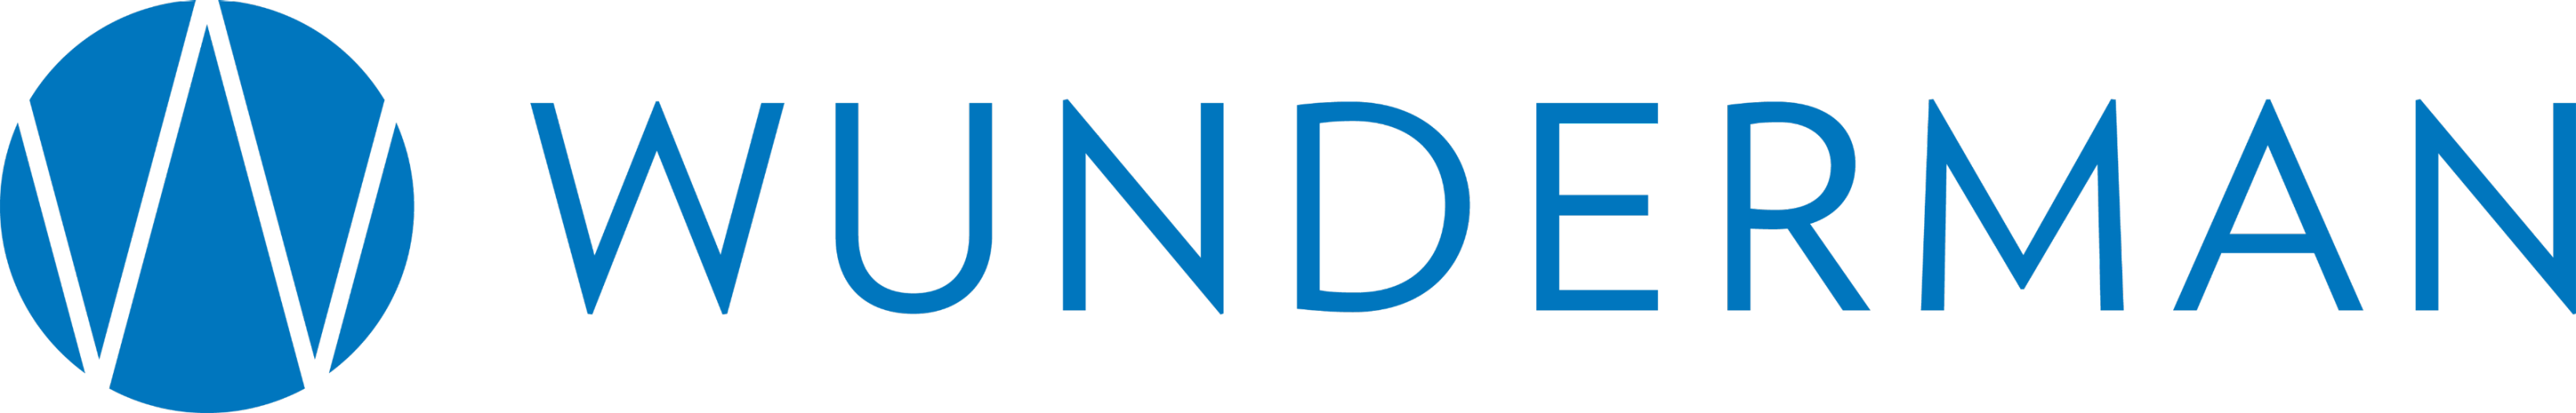 wunderman-logo15